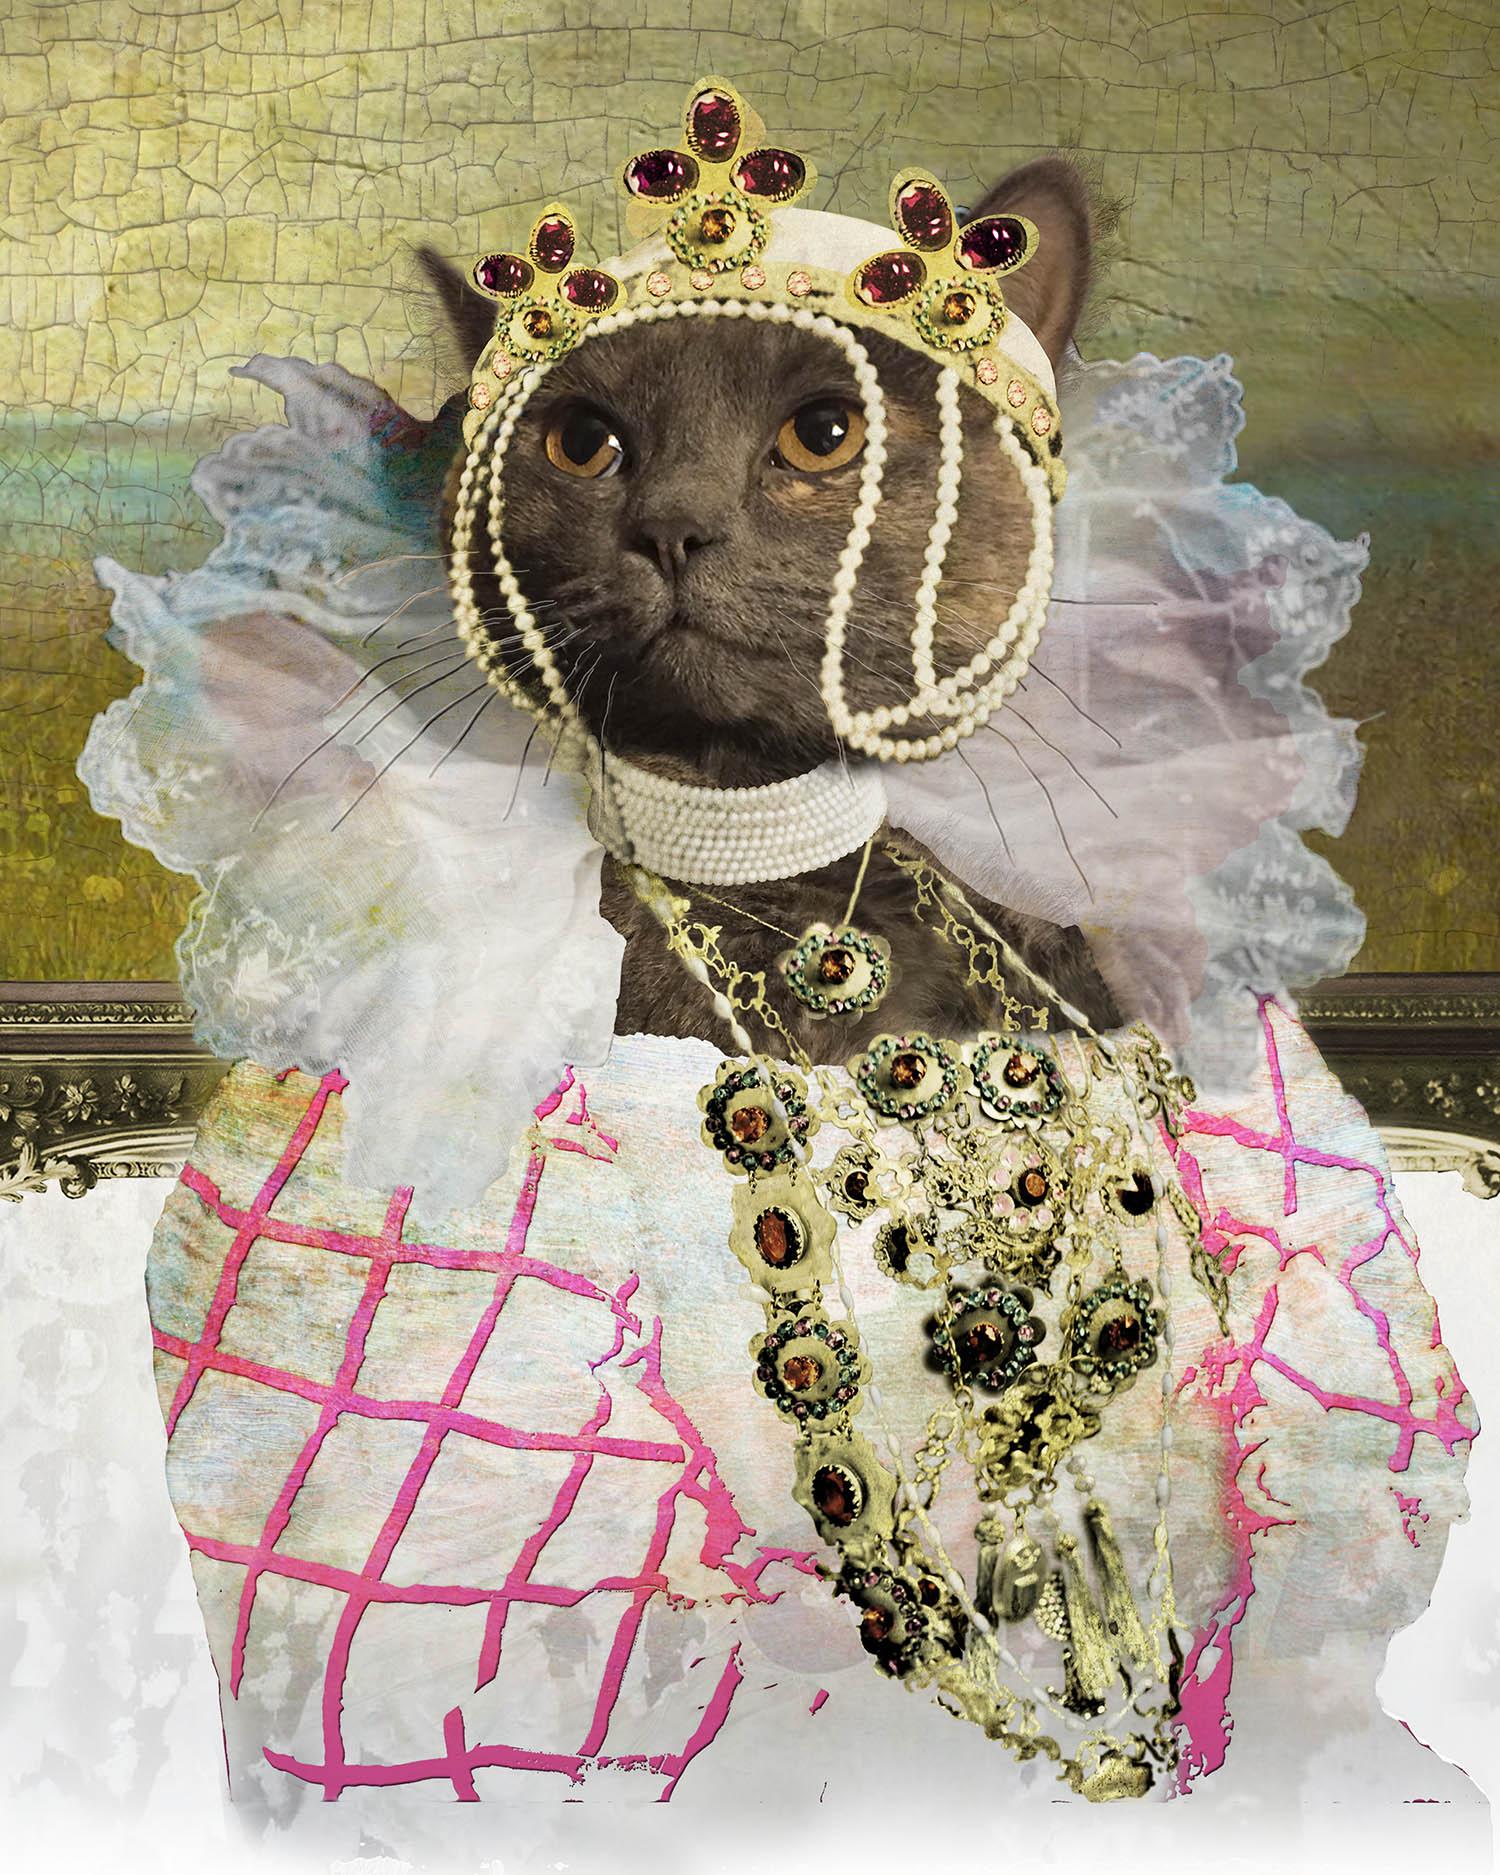 When Nibbles was Queen